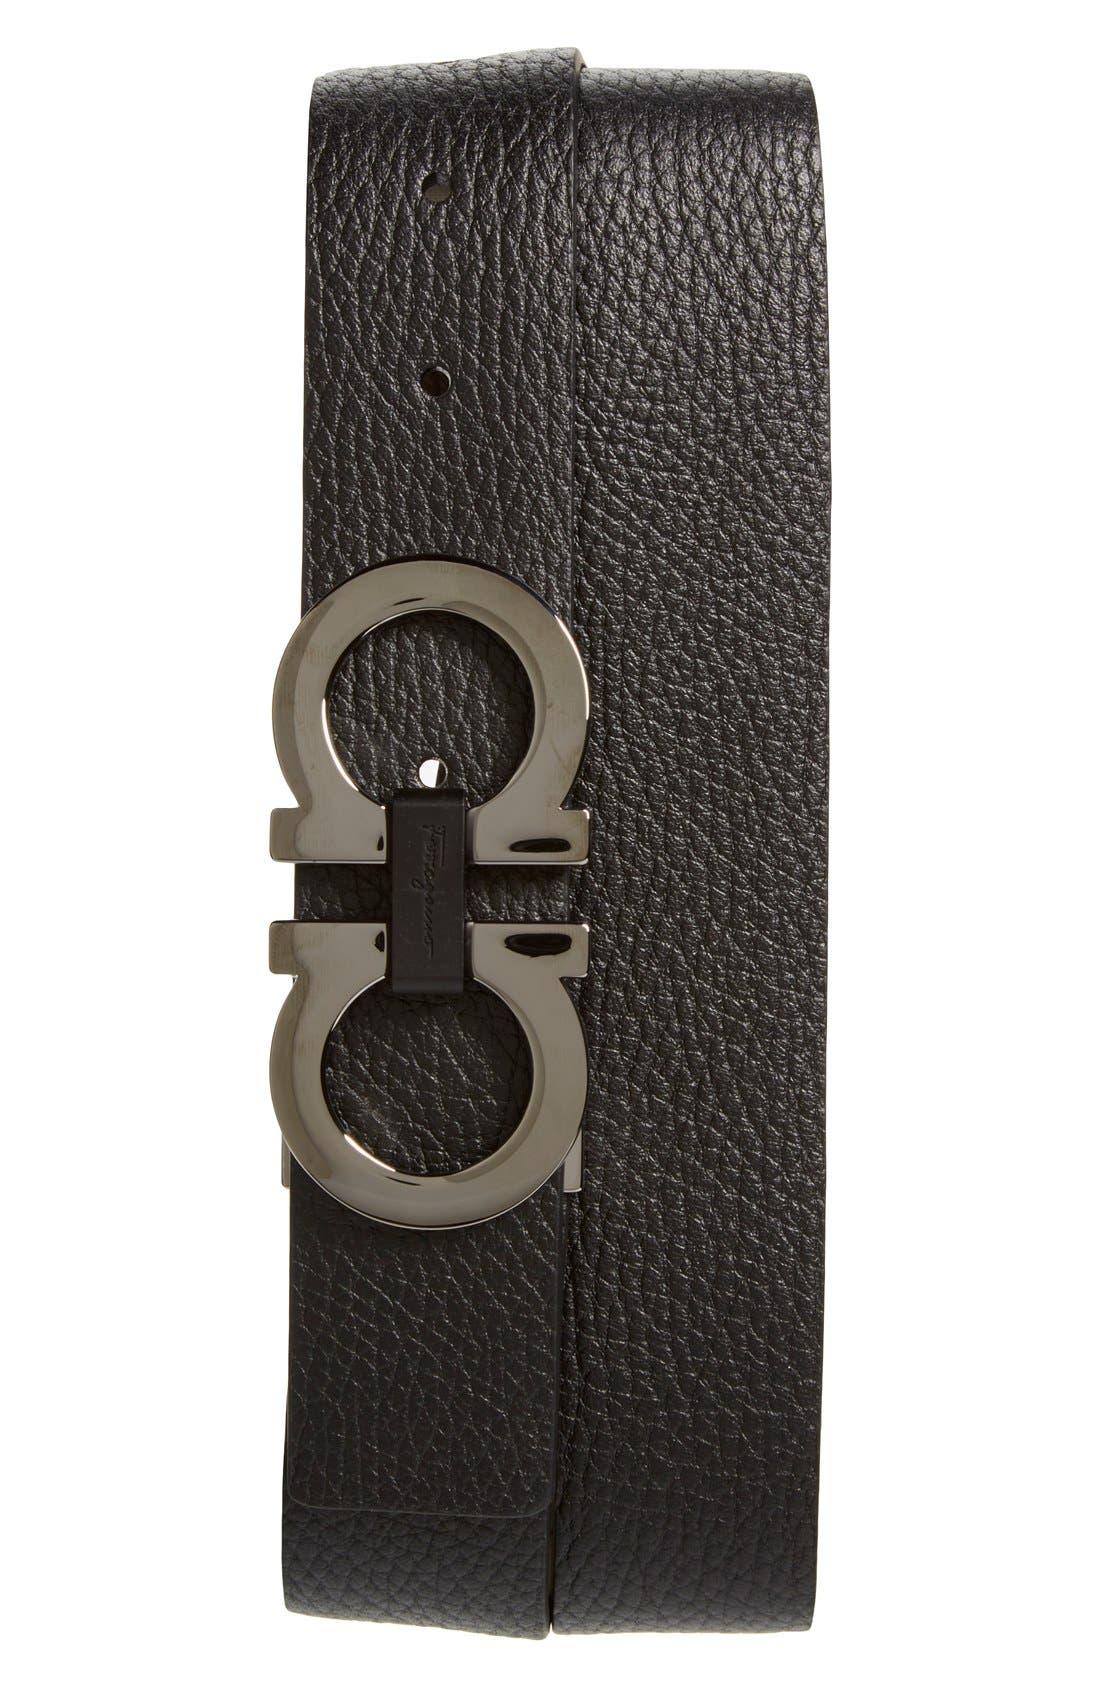 SALVATORE FERRAGAMO, Reversible Double Gancio Belt, Main thumbnail 1, color, BLACK/ HICKORY